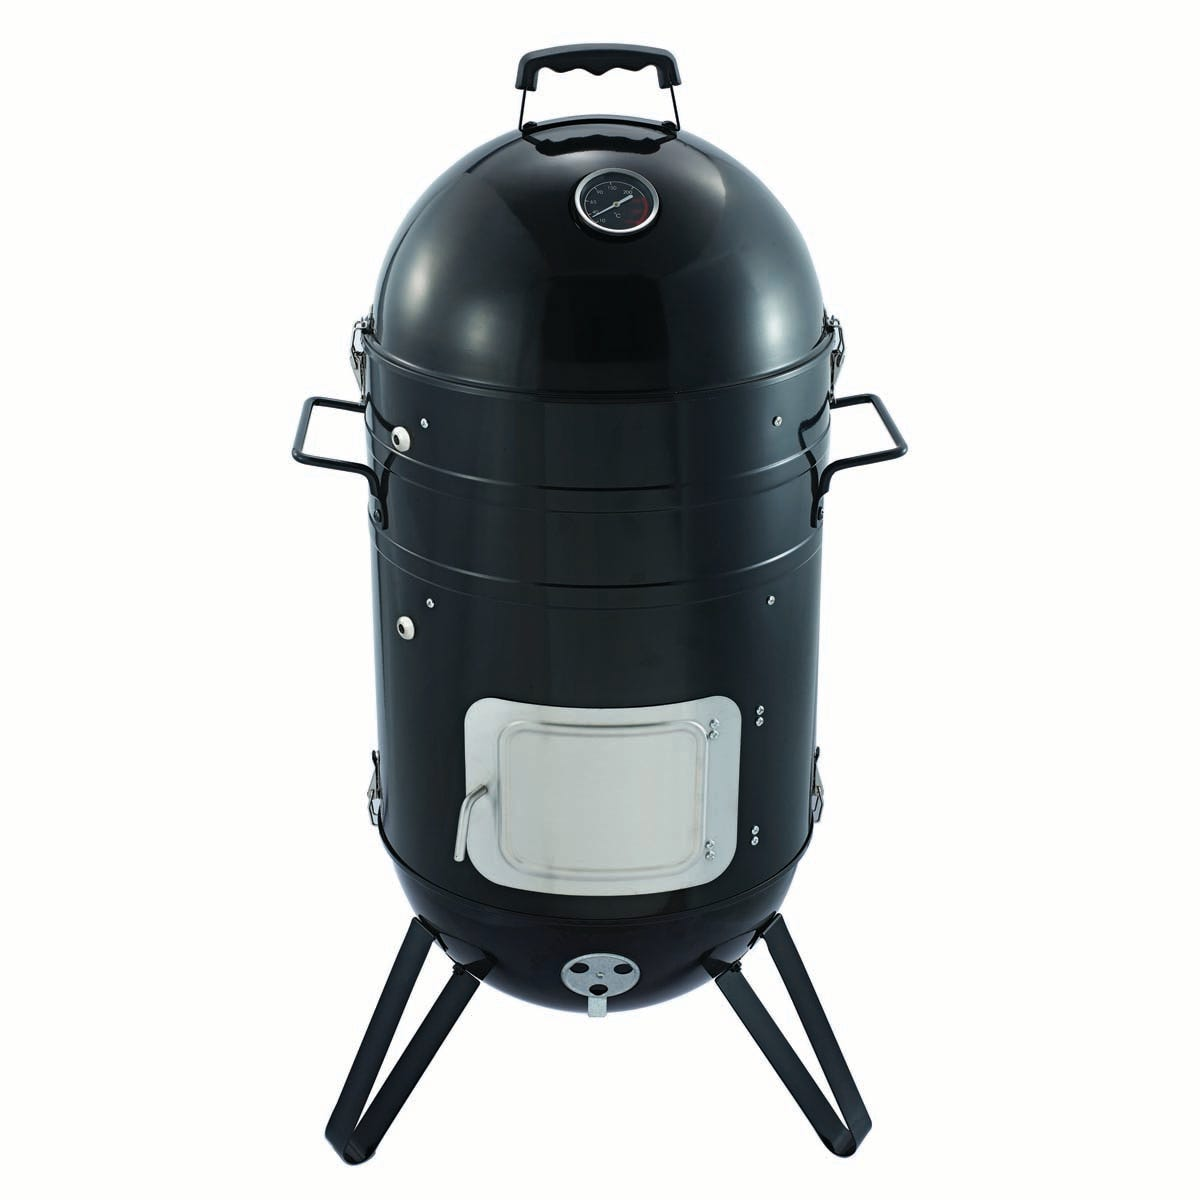 Callow Vertical Charcoal BBQ Smoker Grill